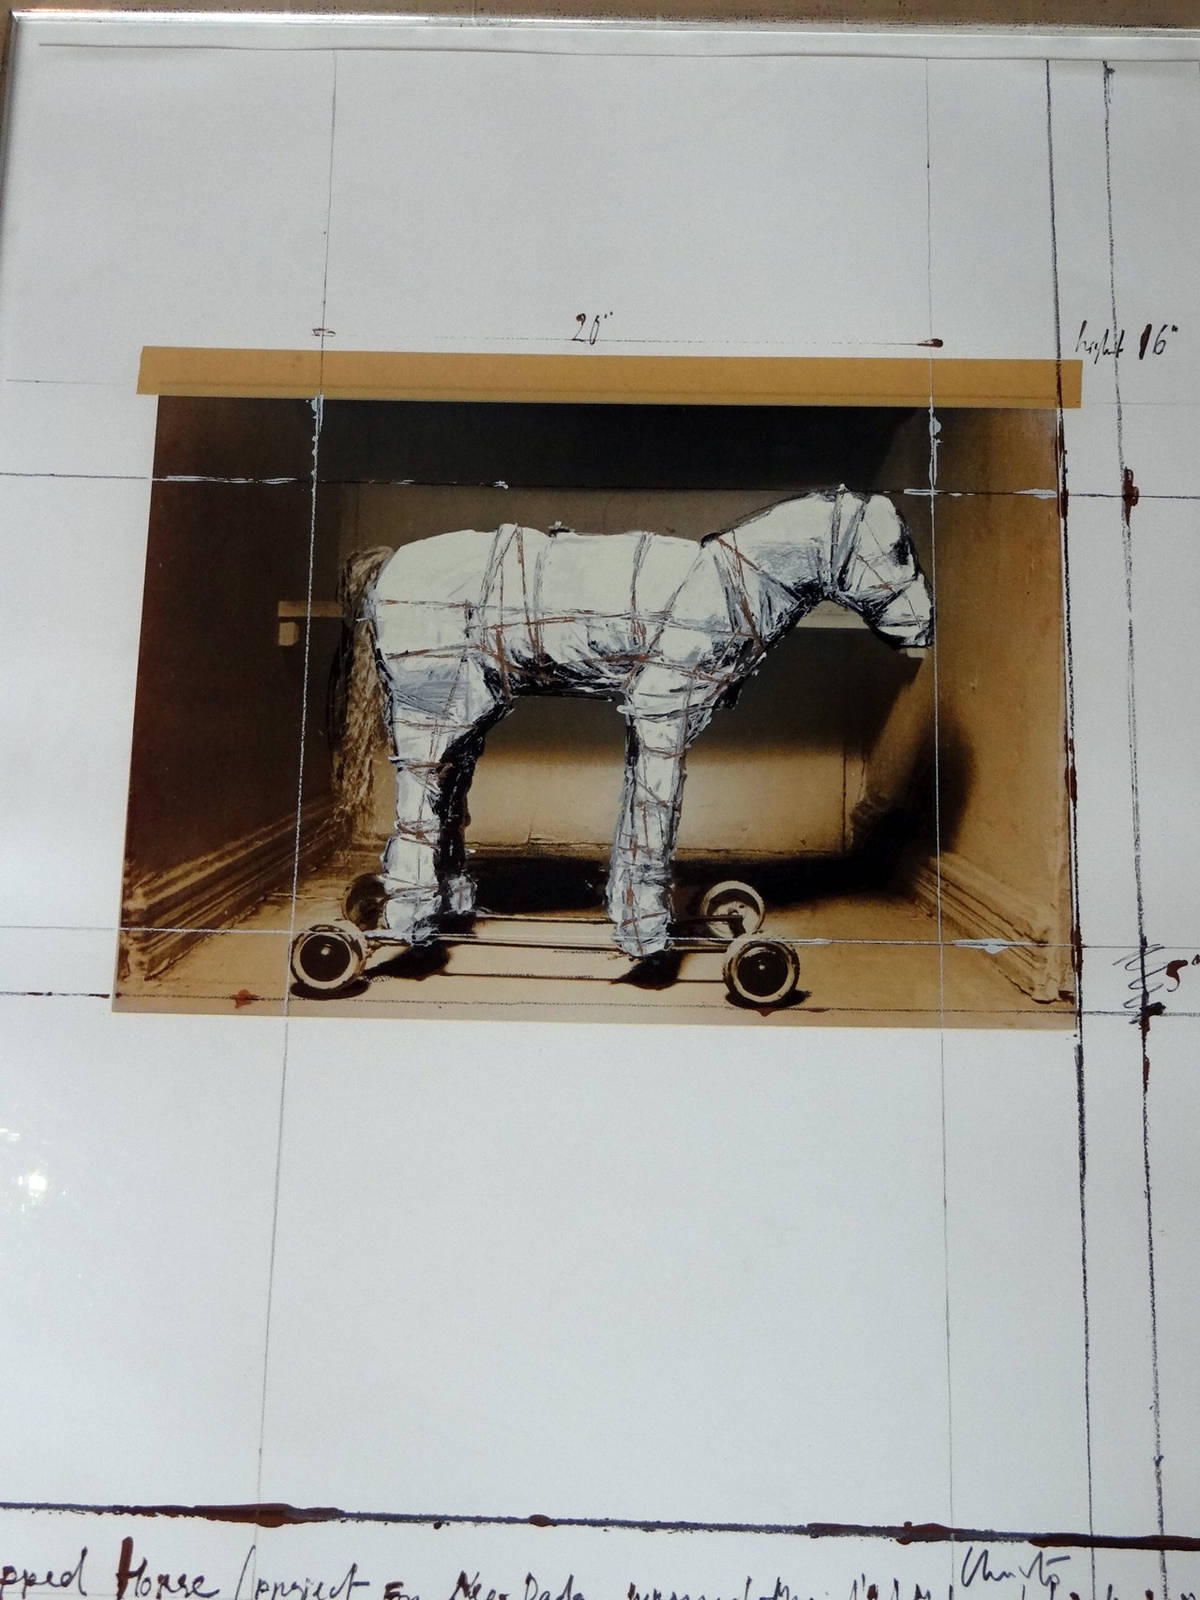 Christo Wrapped horse